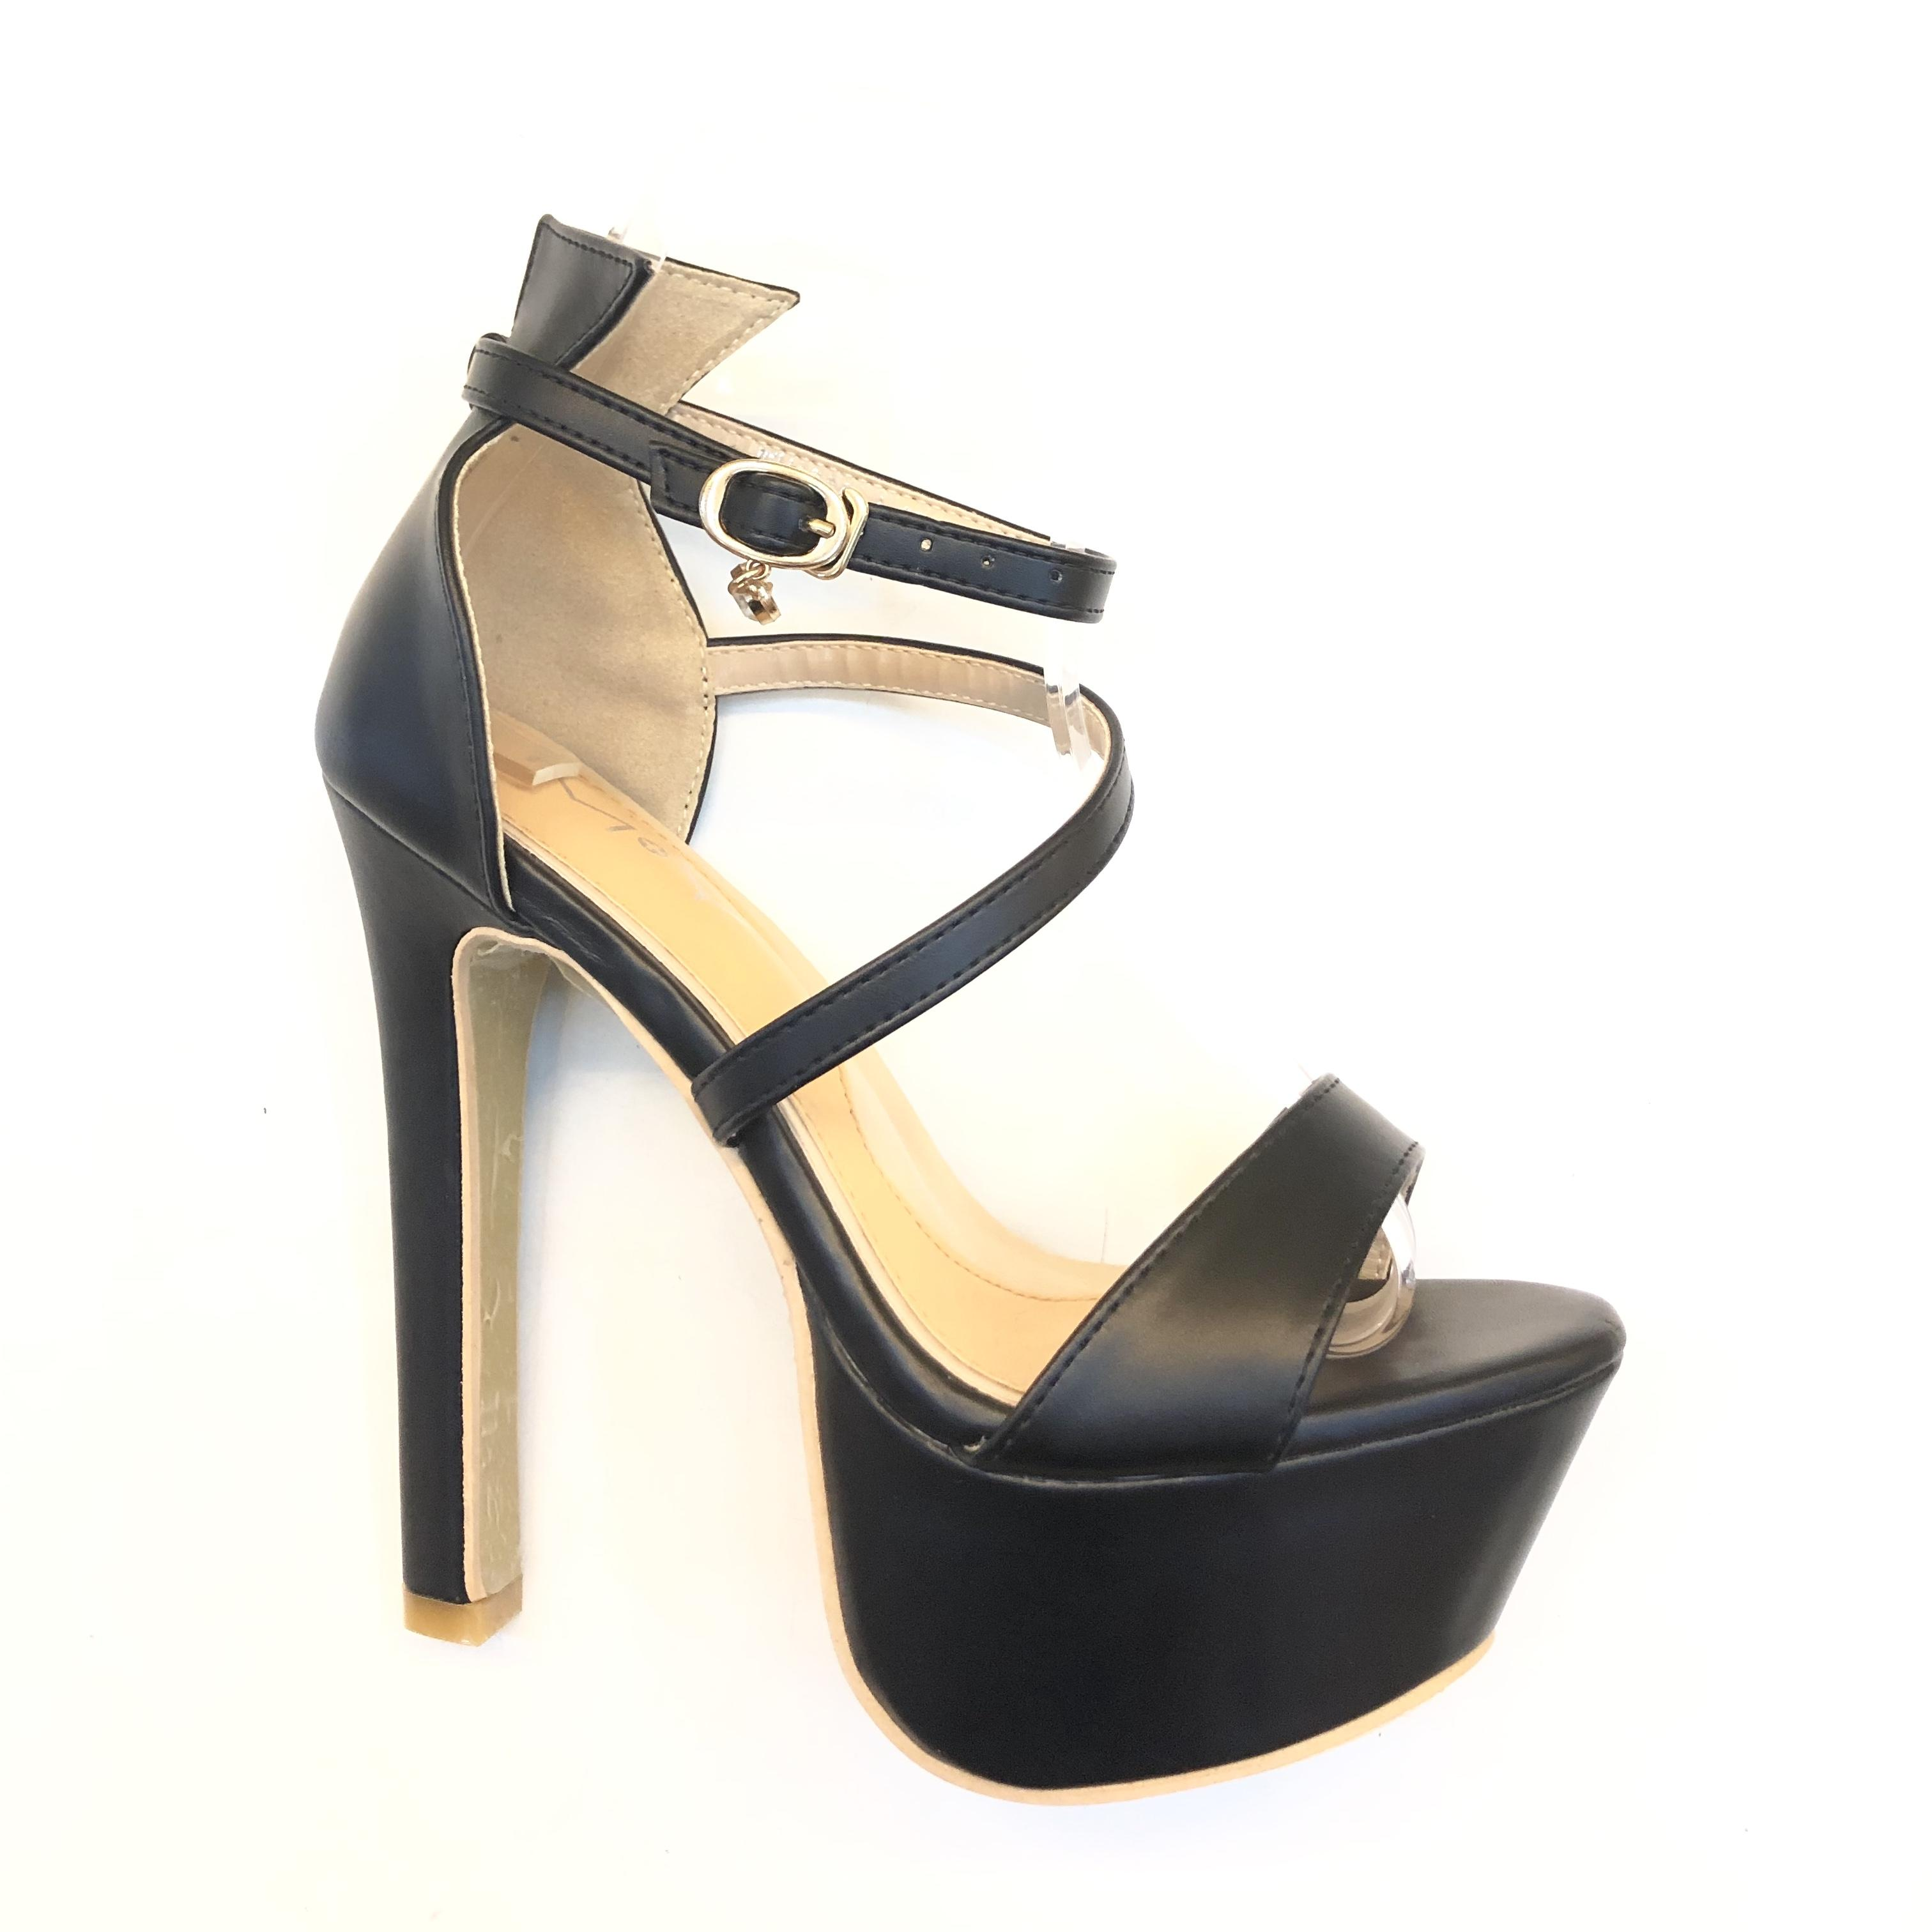 DS Korean Design Summer Women Fashion Platform Stiletto Ankle Crisscross  Strap Buckle Snap Dress Party wedding 177c6c0f3a85